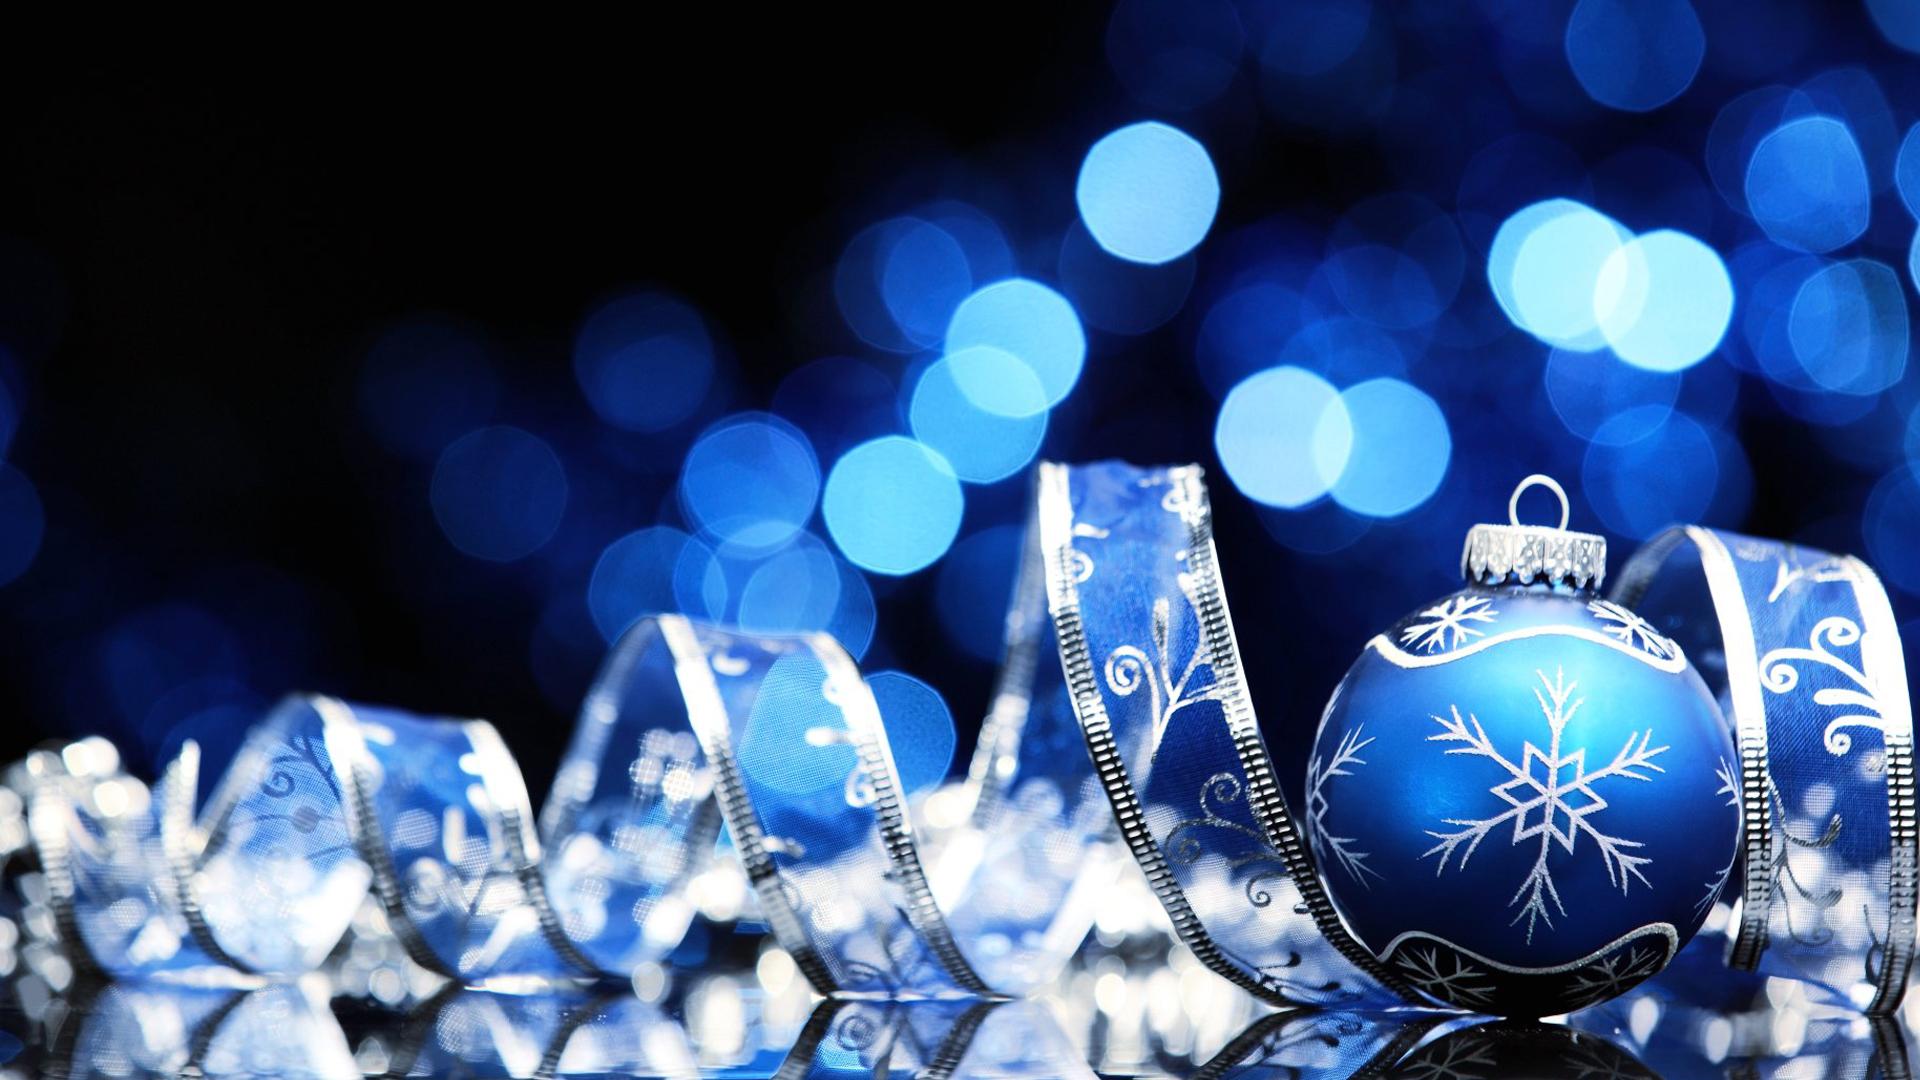 Christmas Backgrounds Best for Kodi 7